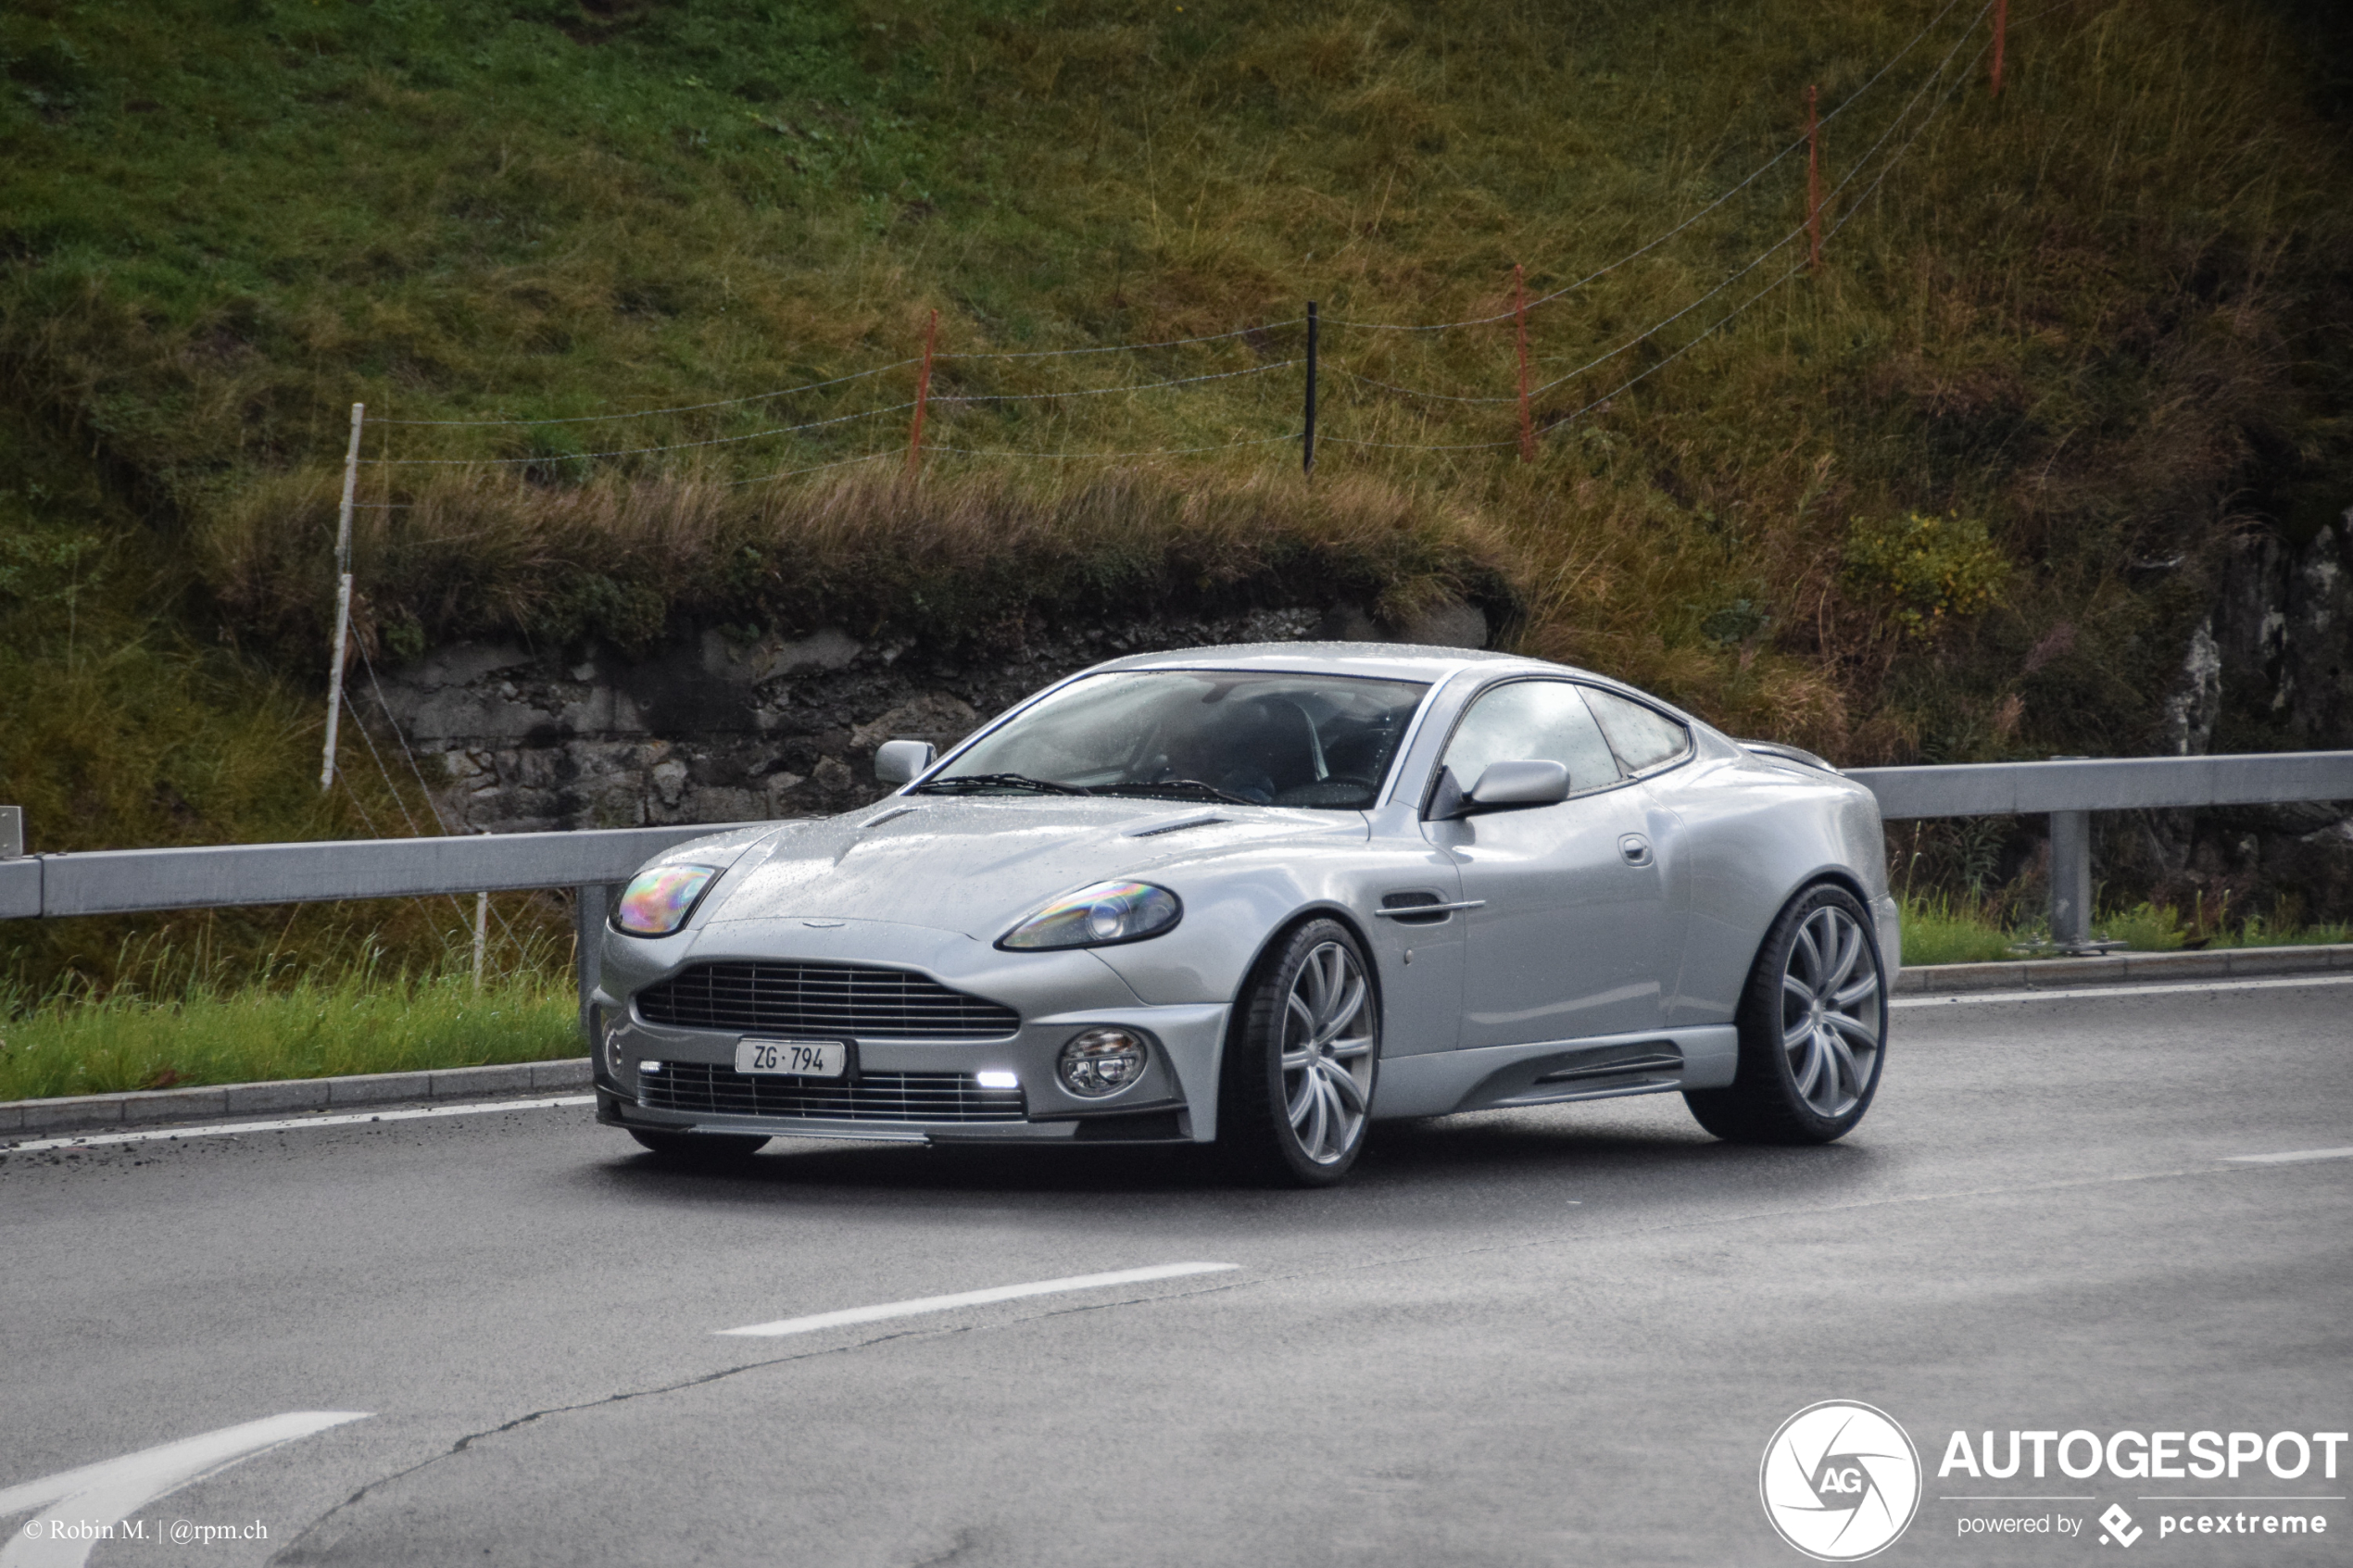 Aston Martin Mansory Vanquish S 26 September 2020 Autogespot